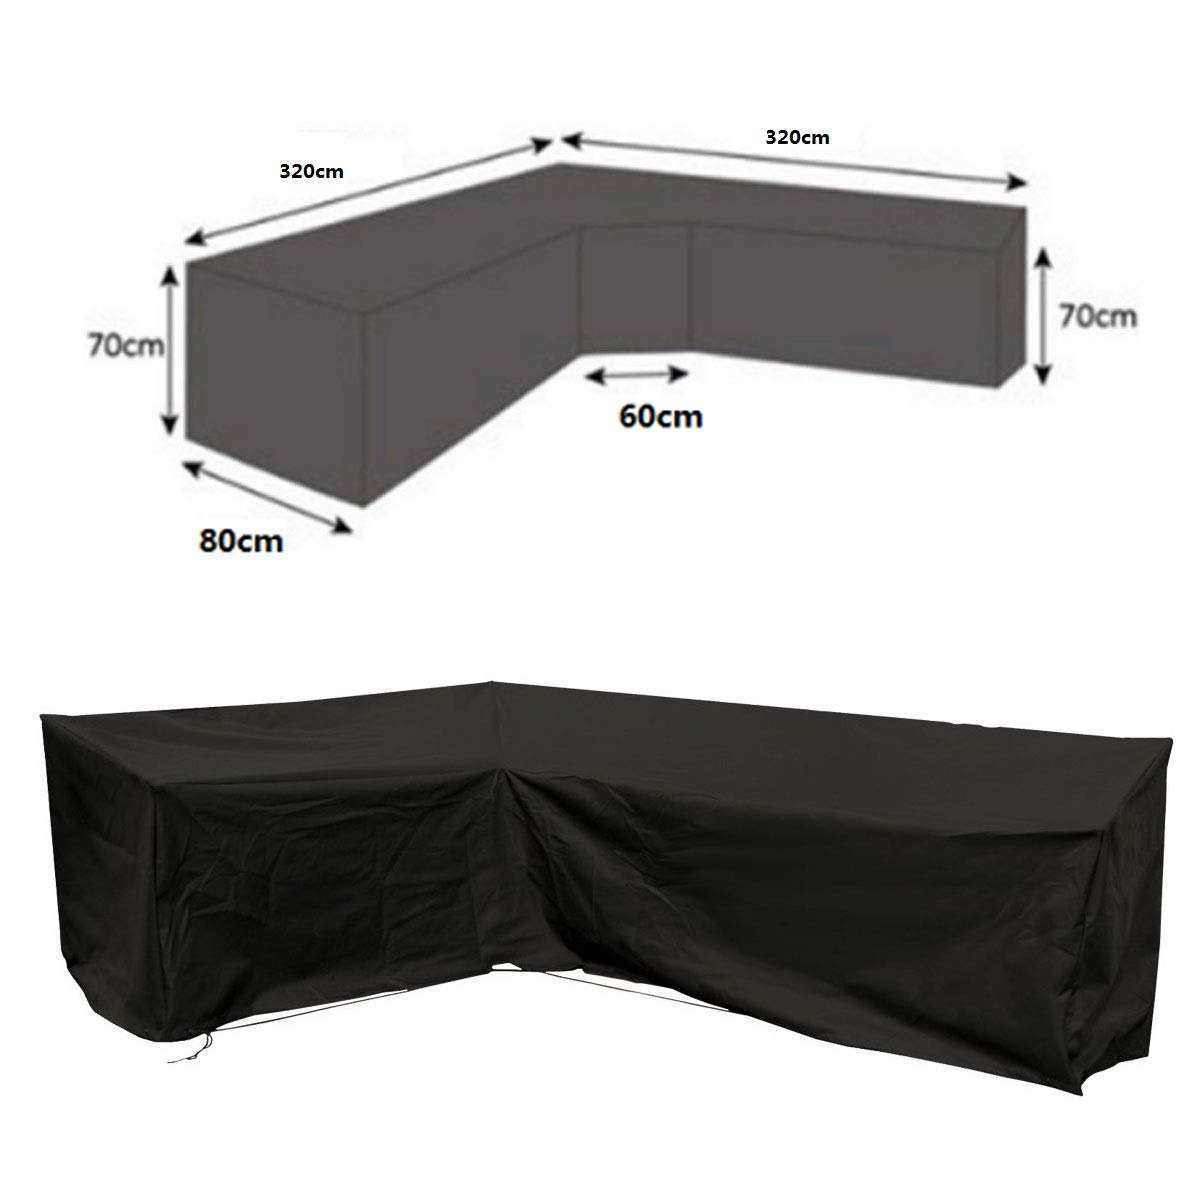 dDanke Patio L Shape Sofa Covers Universal Sectional Furniture Cover with Locking Rope Waterproof Dustproof 320x320cm by dDanke